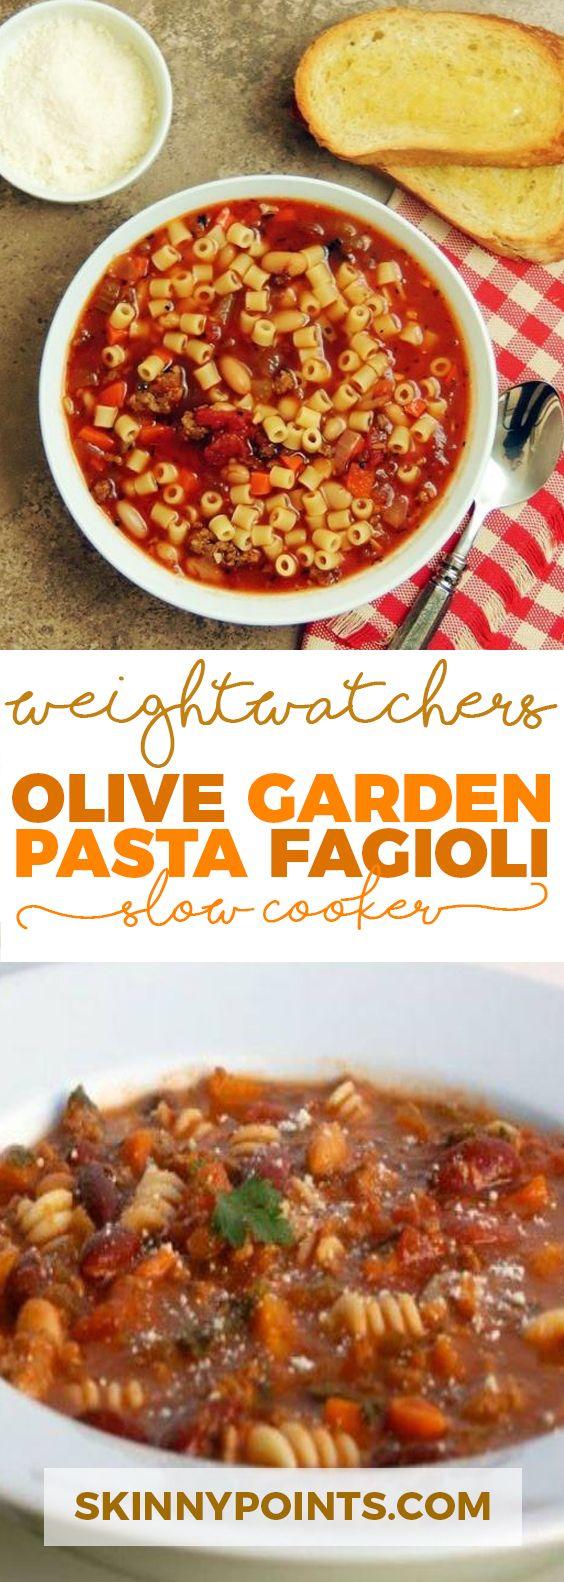 Best 20+ Olive garden salad ideas on Pinterest | Olive ...